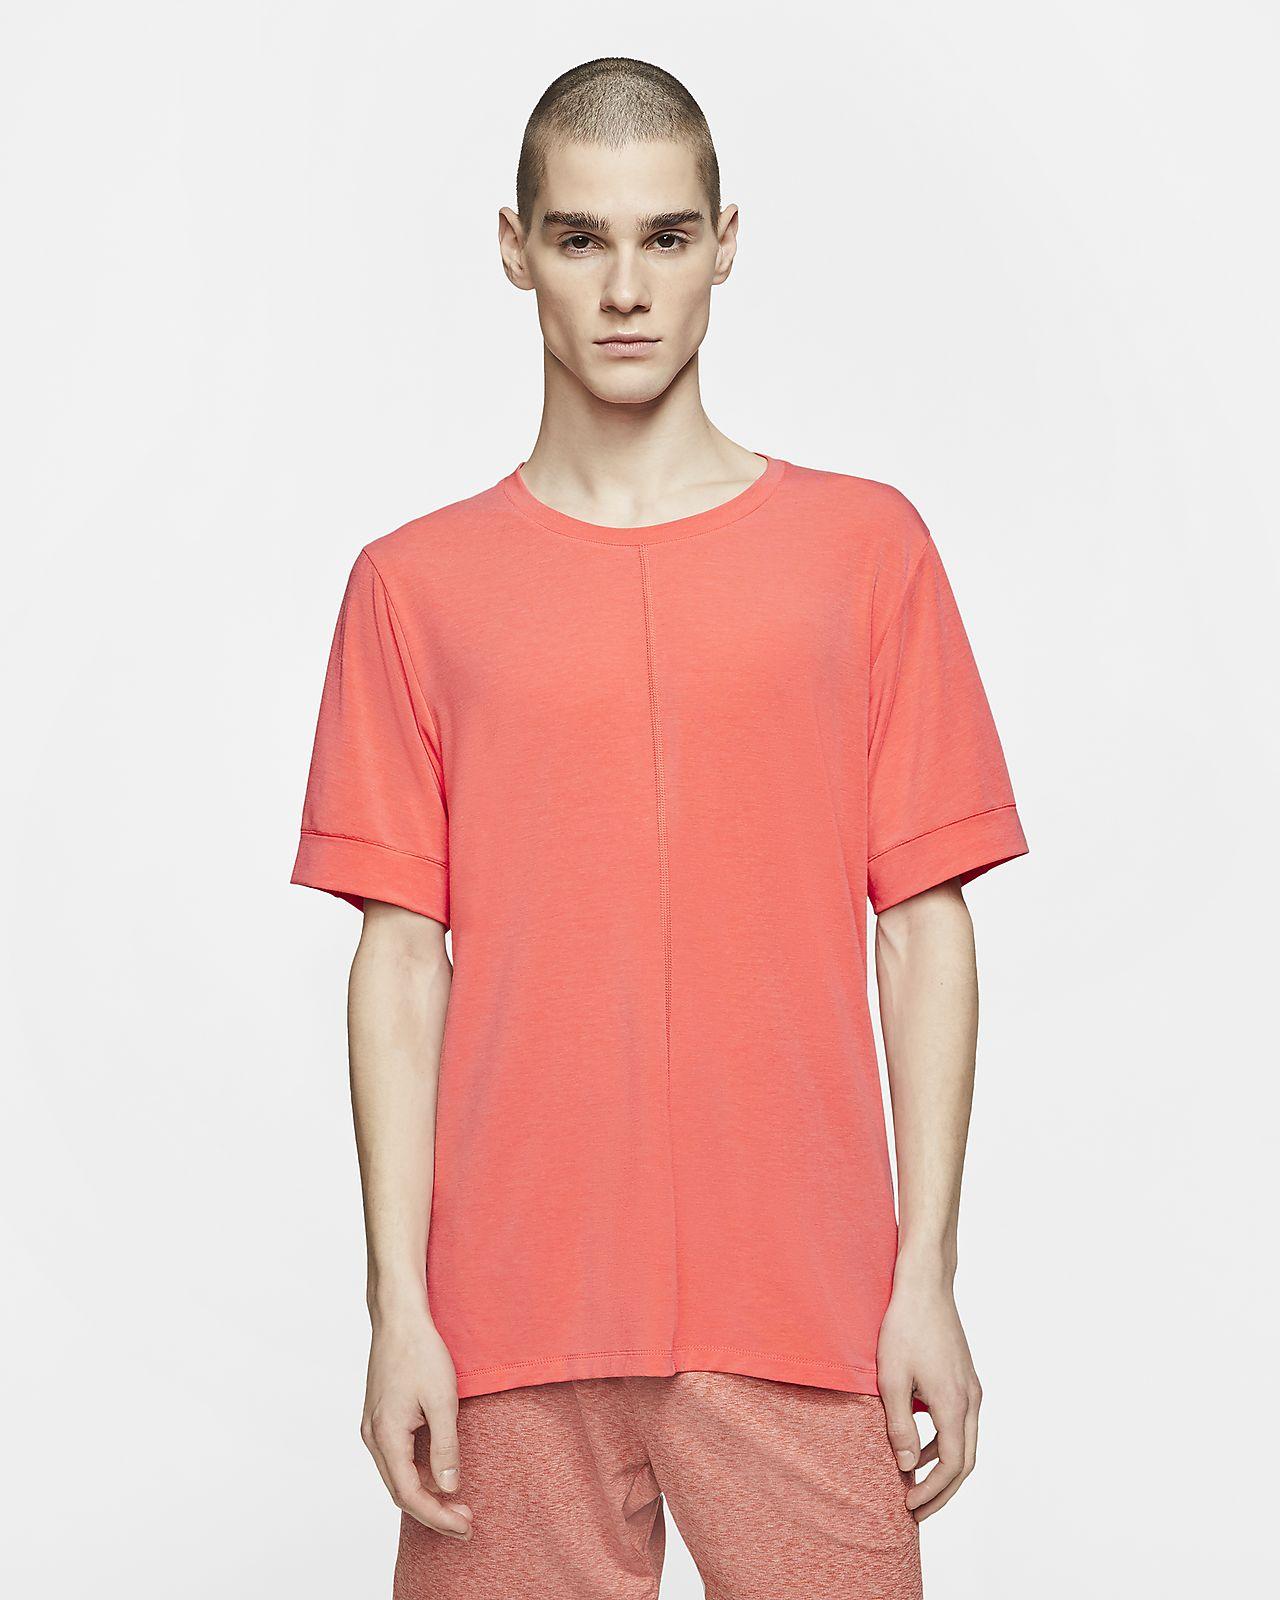 Nike Yoga Dri-FIT Kurzarmshirt für Herren